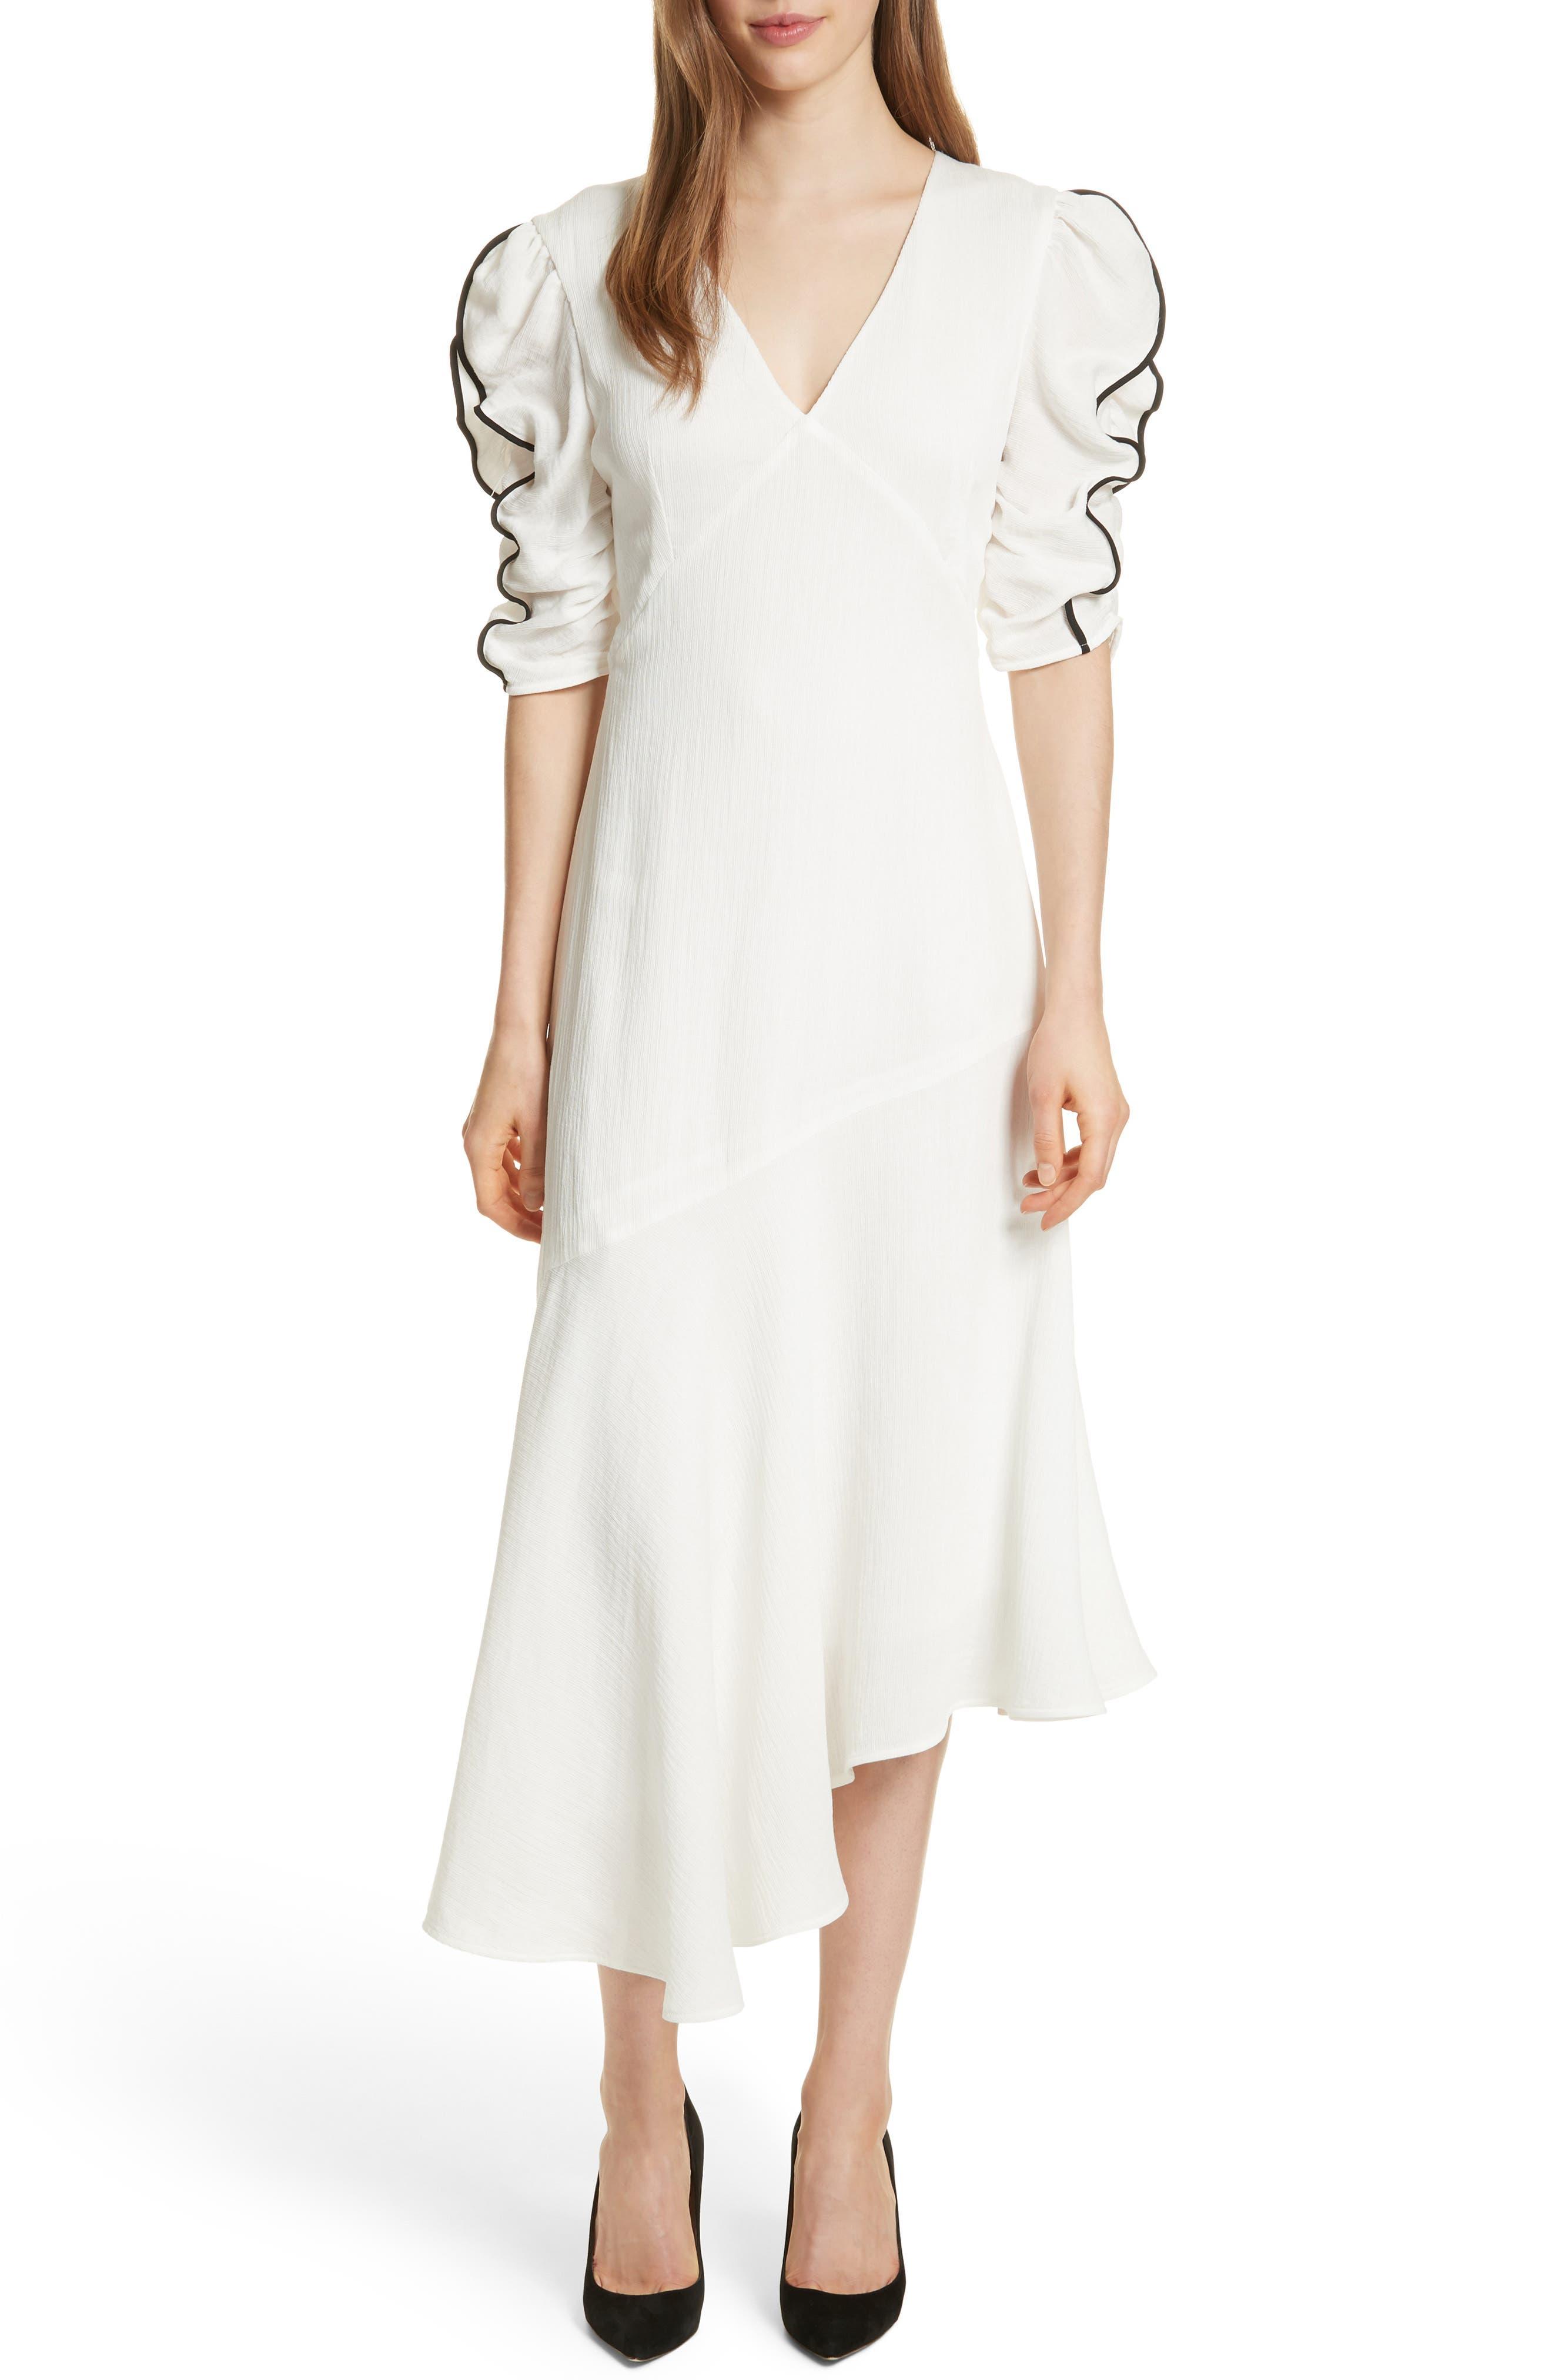 Prose & Poetry Shirley Ruffle Sleeve Midi Dress,                             Main thumbnail 1, color,                             Alabaster